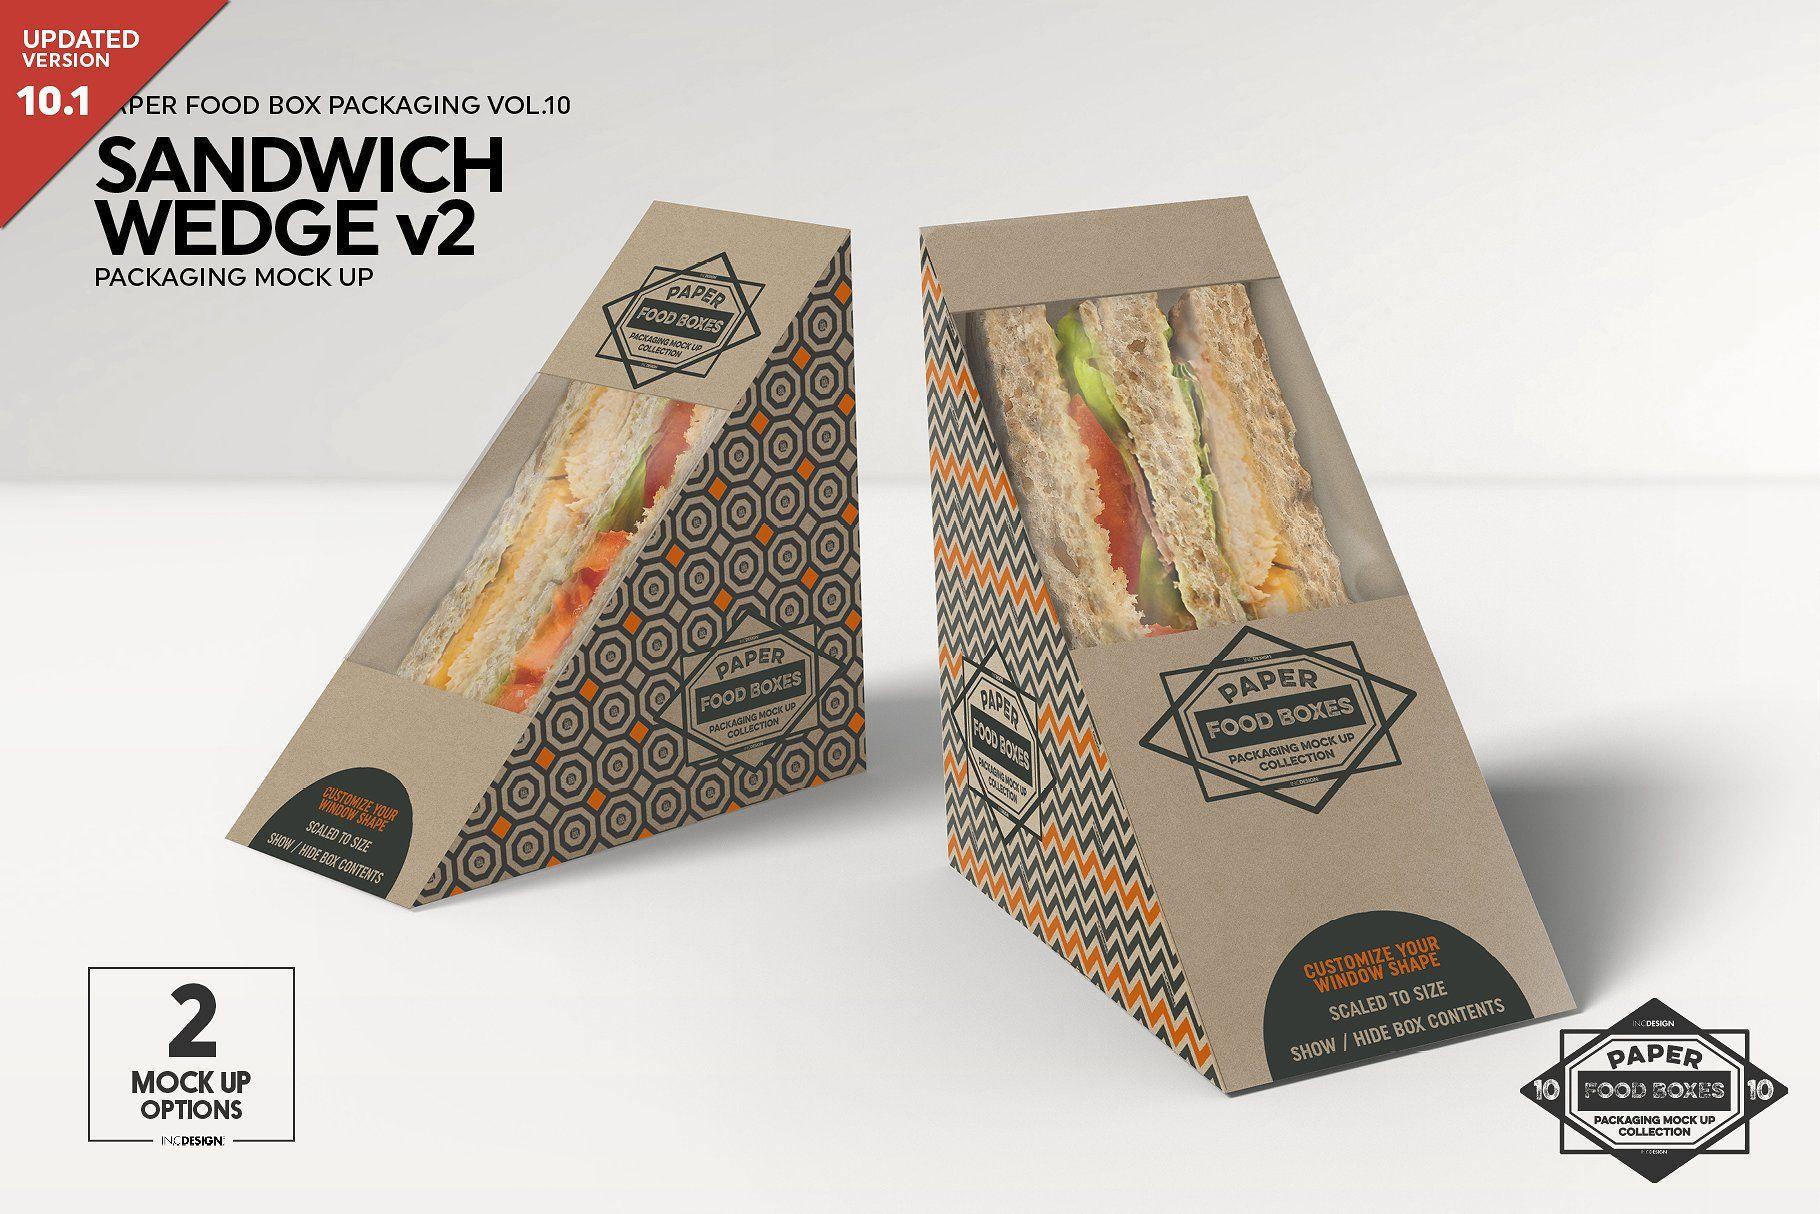 Download Sandwich Wedge Box V2 Mockup Free Packaging Mockup Food Box Packaging Packaging Mockup